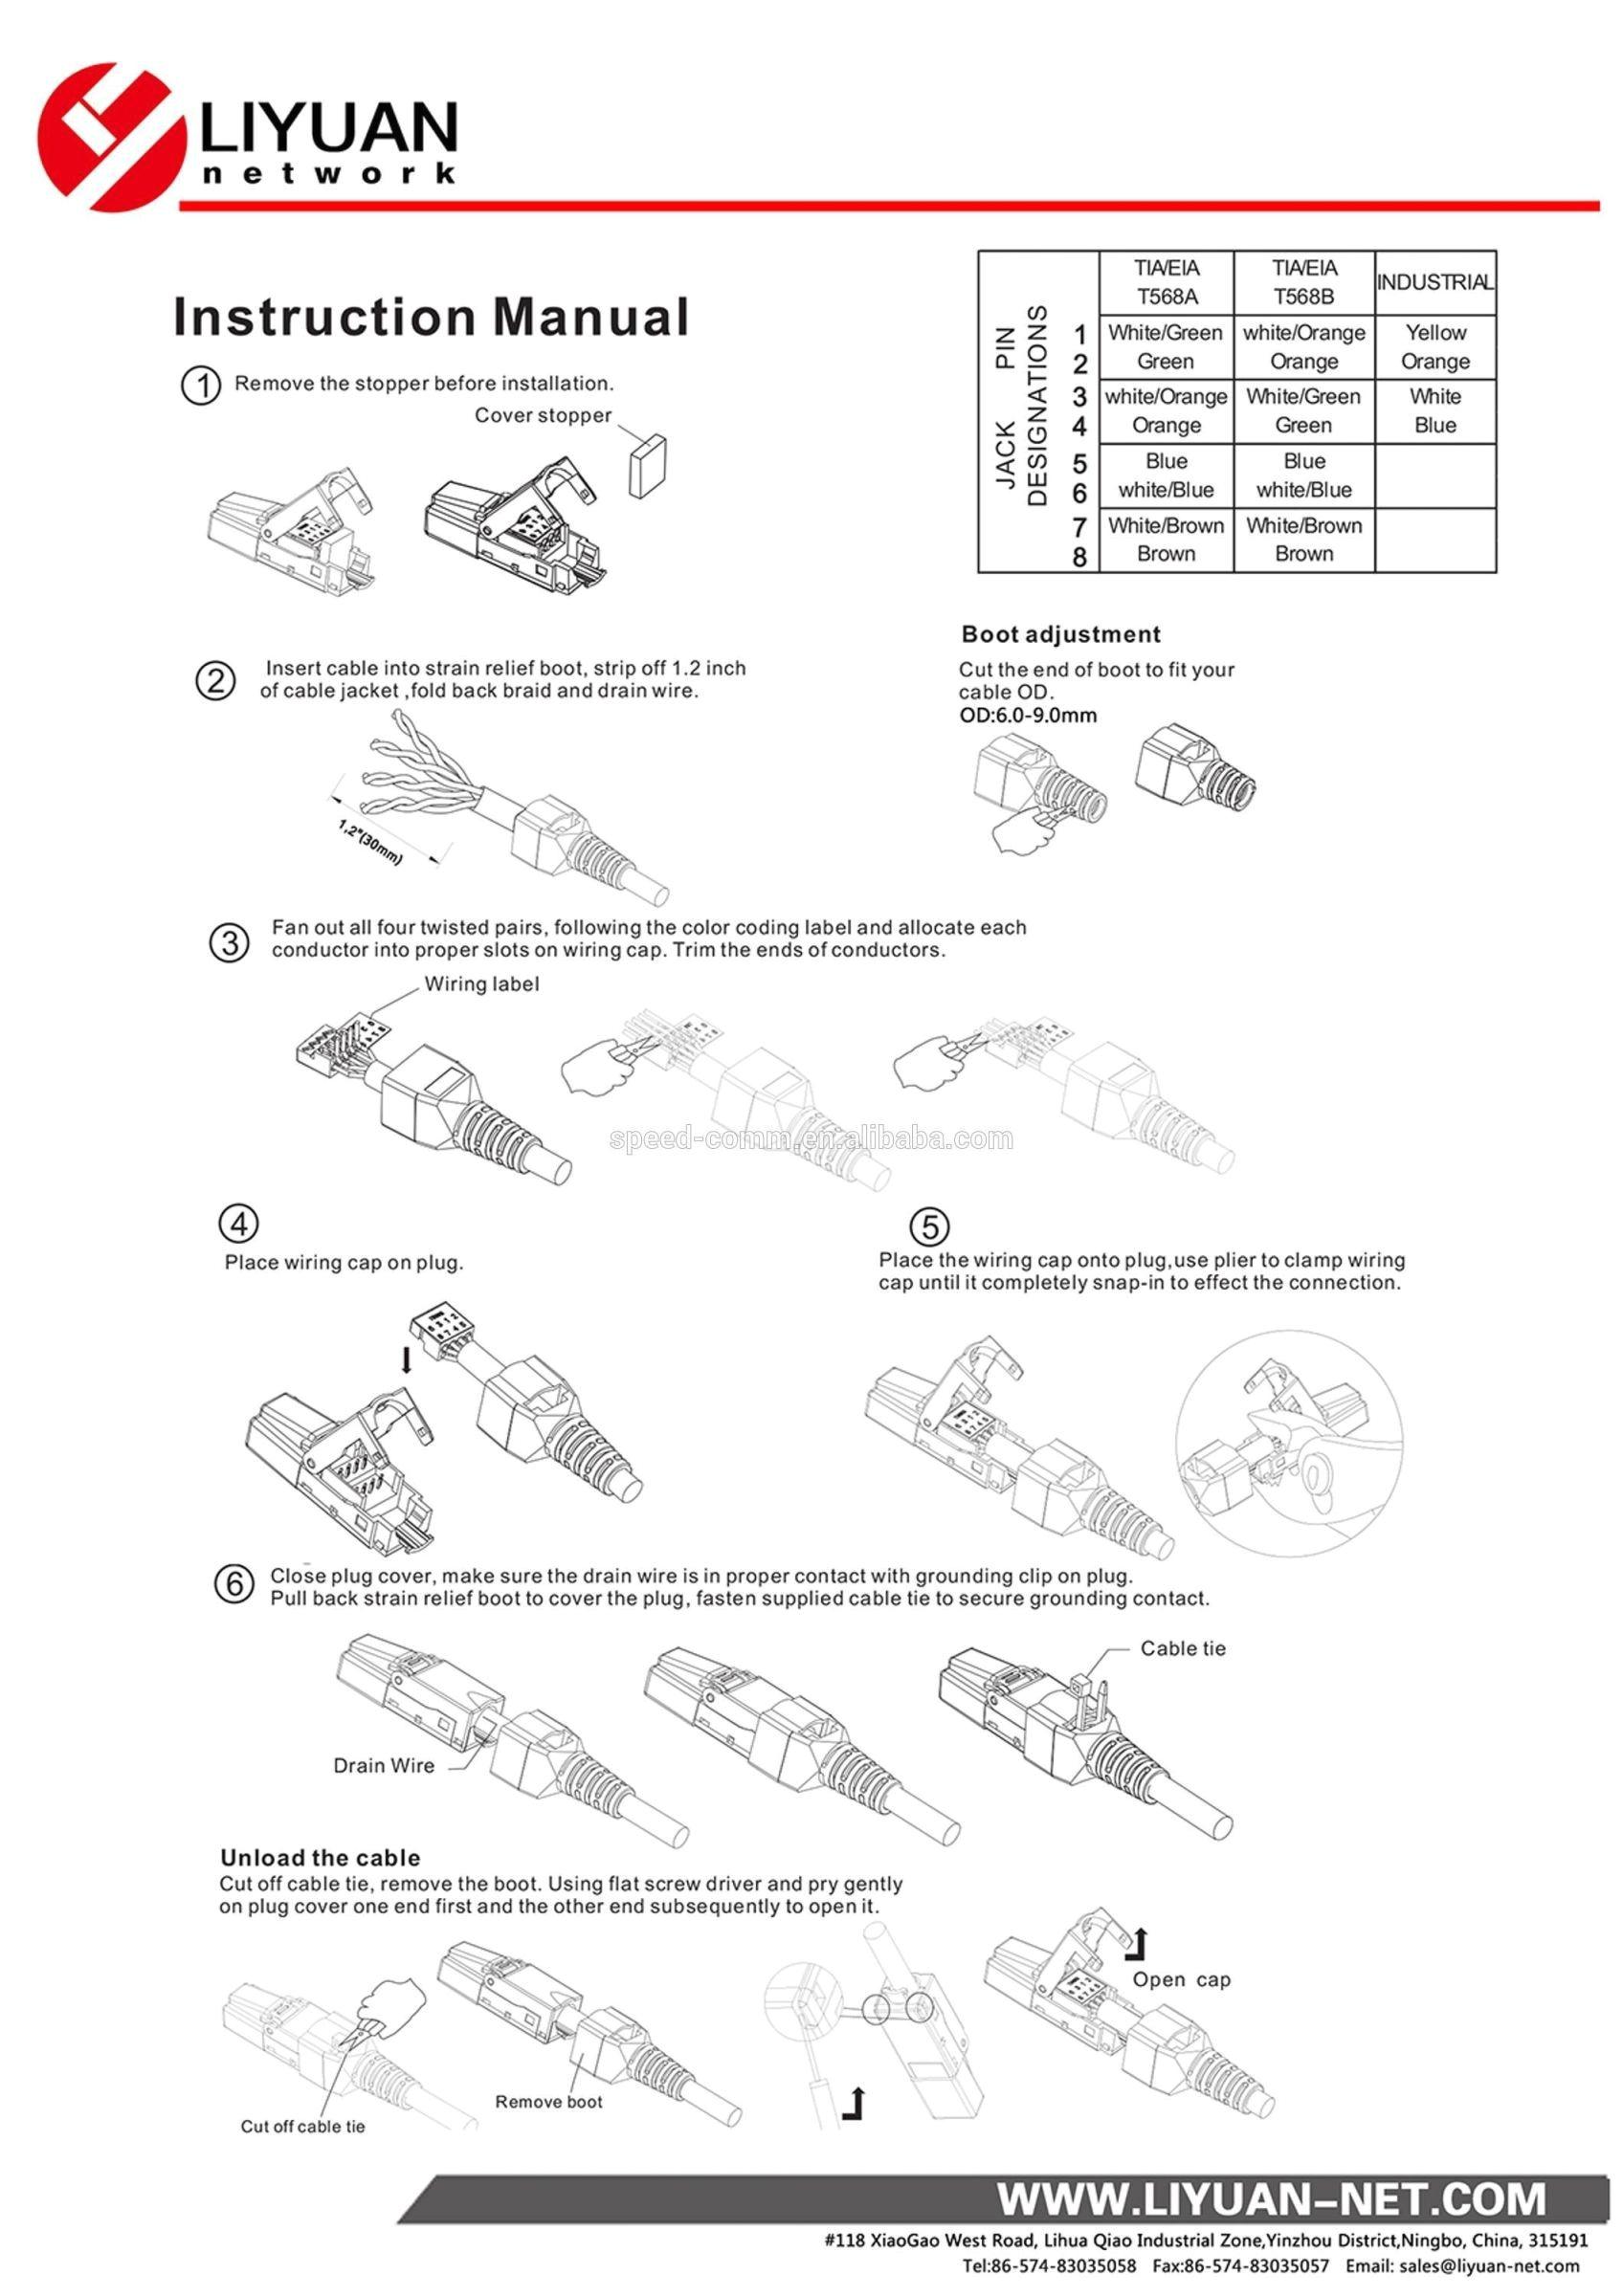 xlr wiring diagram lable wiring diagram for you simple wiring diagram fresh 2001 ford f 150